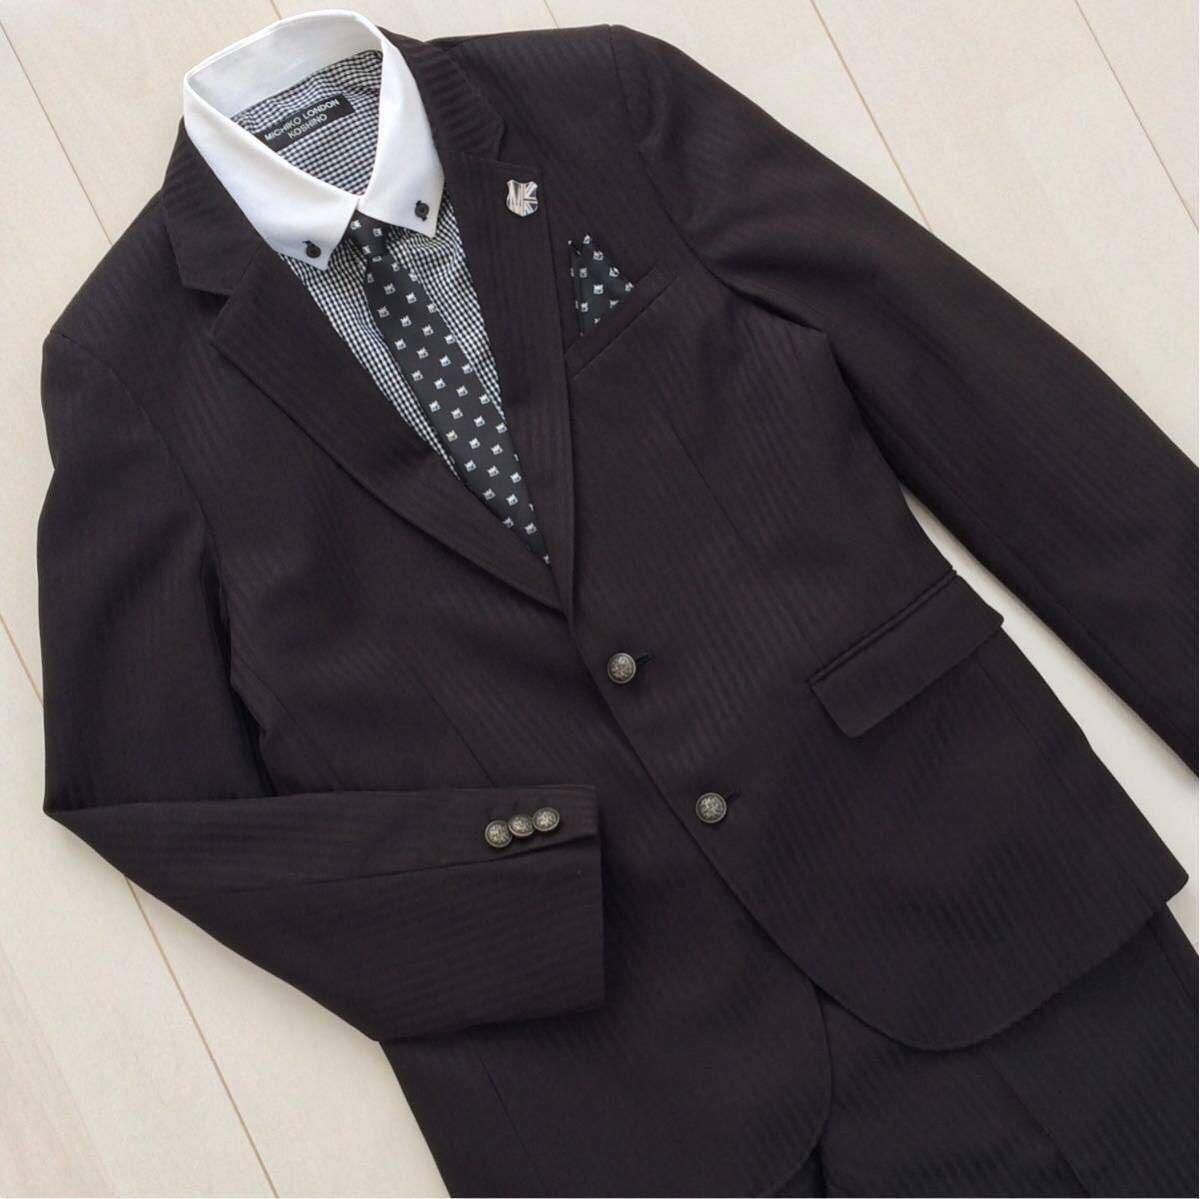 6a5857115ea8e 美品 ミチコロンドン スーツ 5点セット 165cm 165Aフォーマル 受験 面接 卒業式 入学